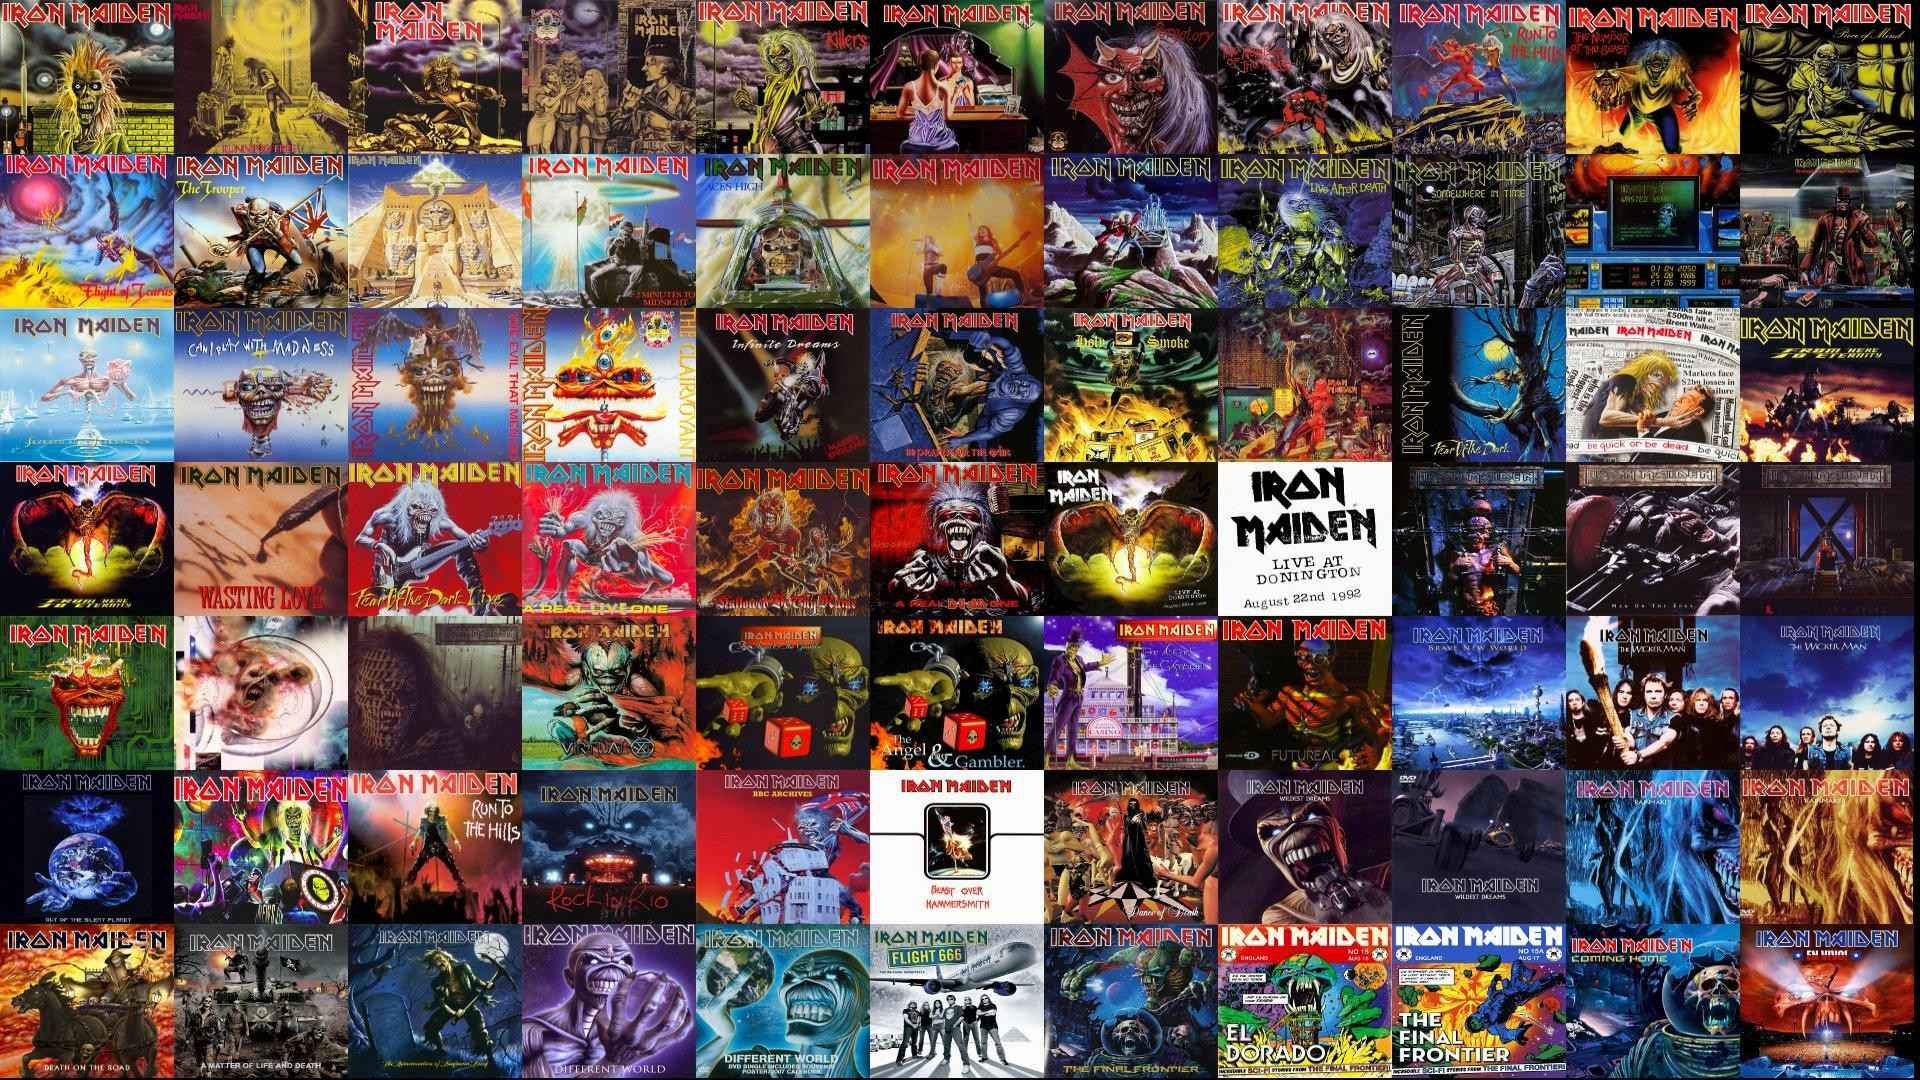 Wiki Iron Maiden Heavy Metal Dark Album   Data Src - Iron Maiden All Covers - HD Wallpaper